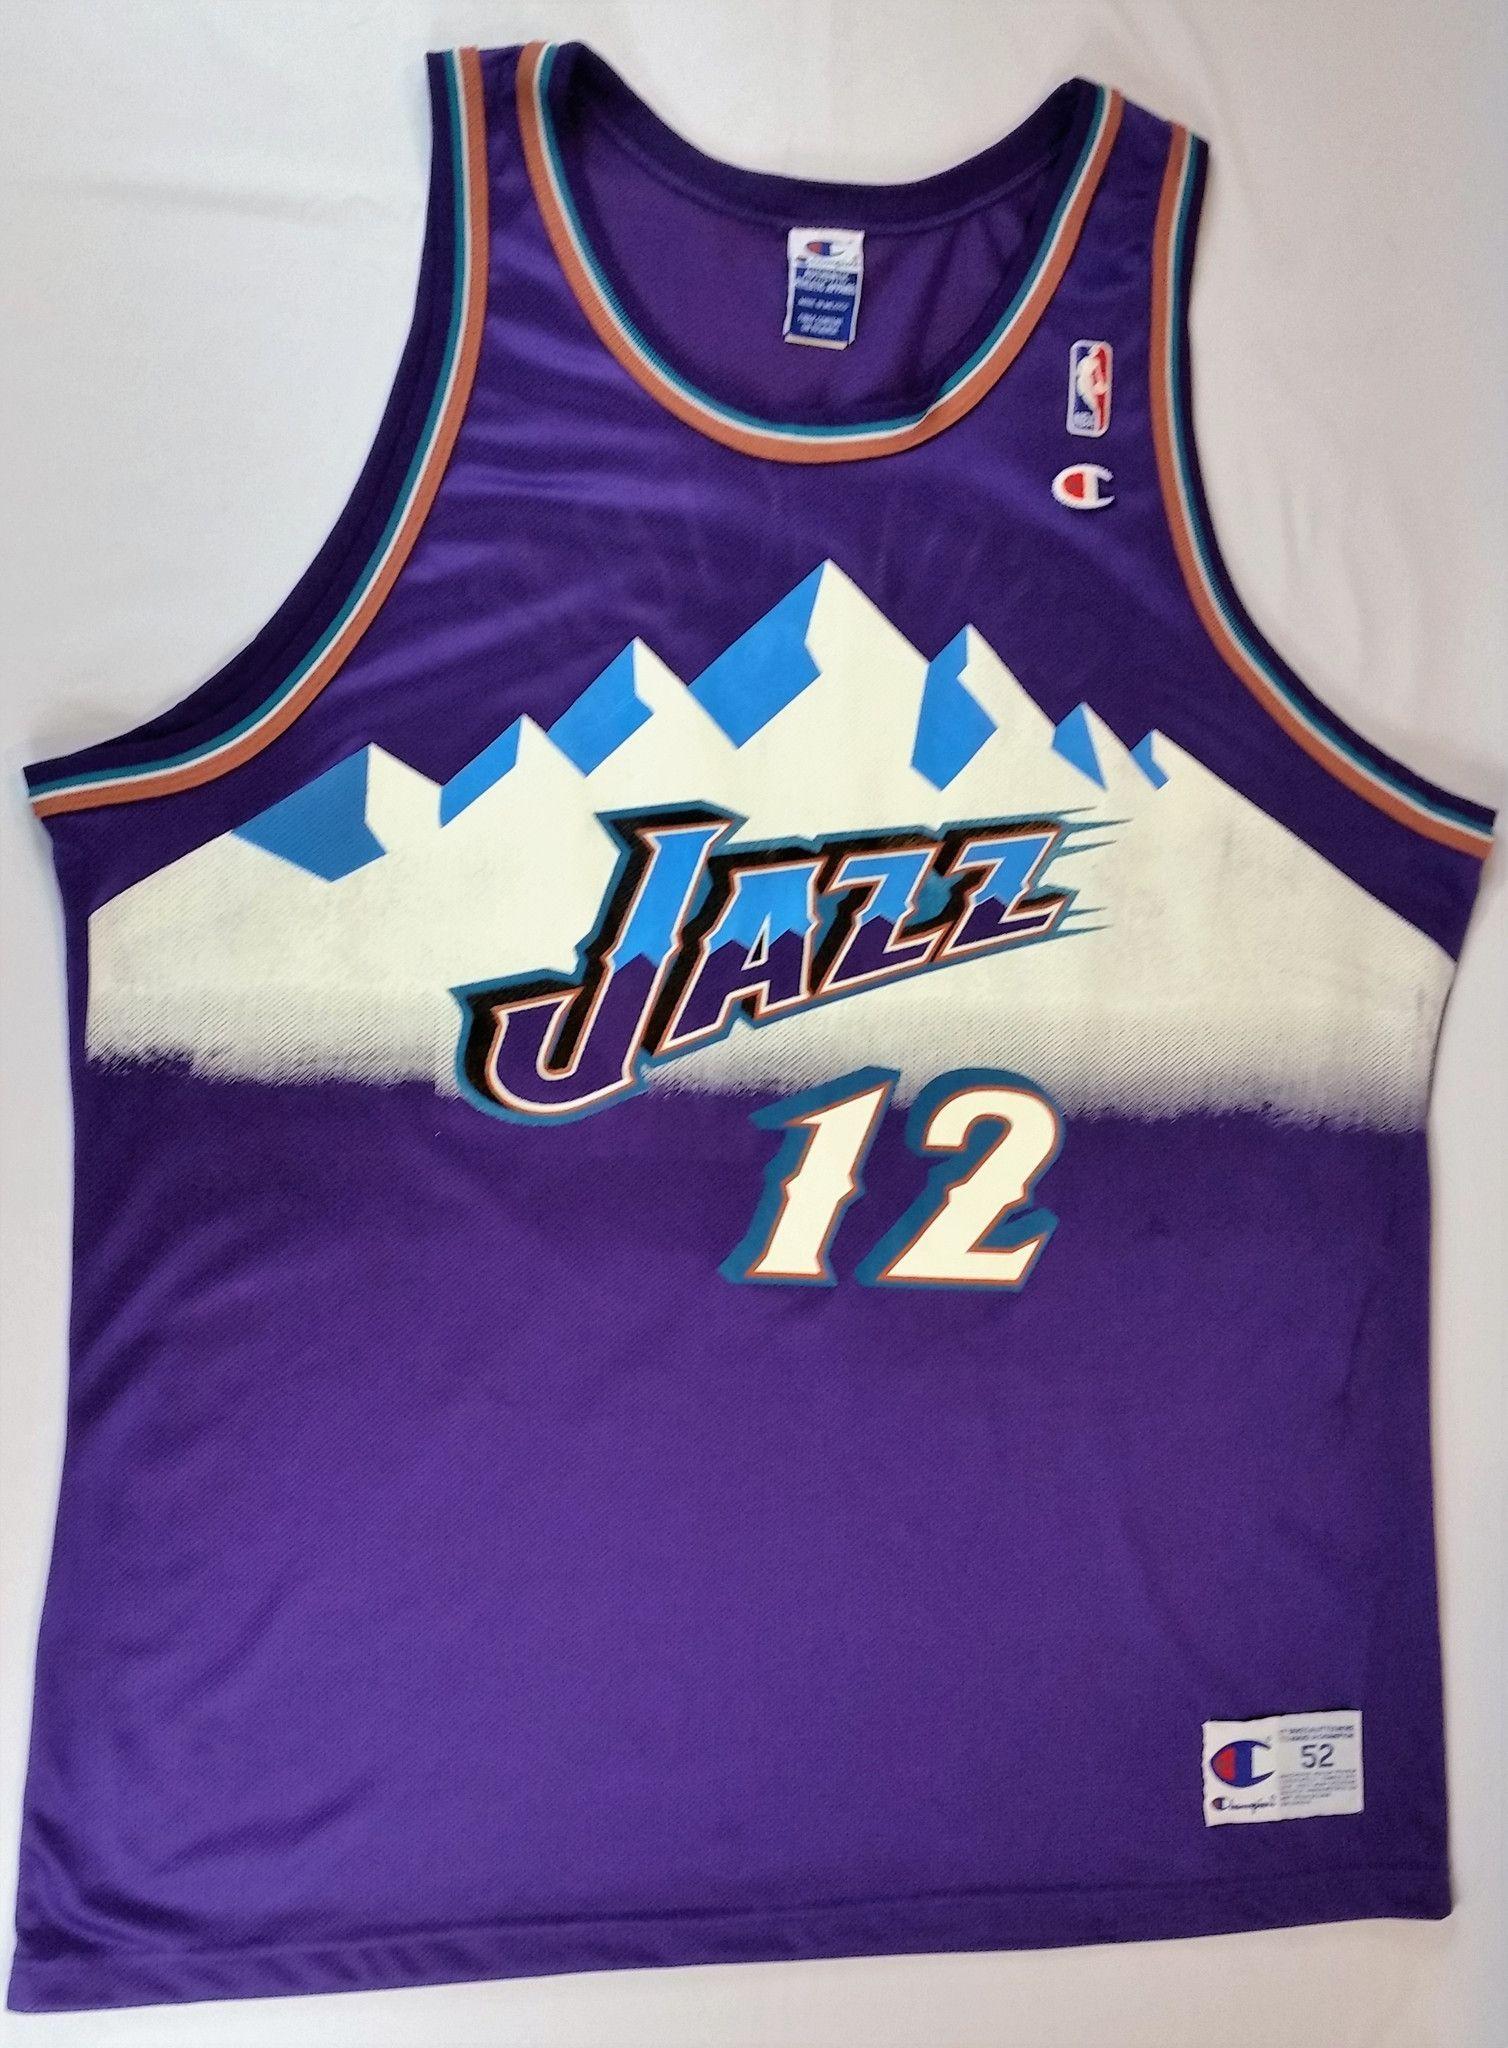 768cce56e3c John Stockton Champion Jersey NBA Utah Jazz Alternate Mountain RARE Malone  sz 52